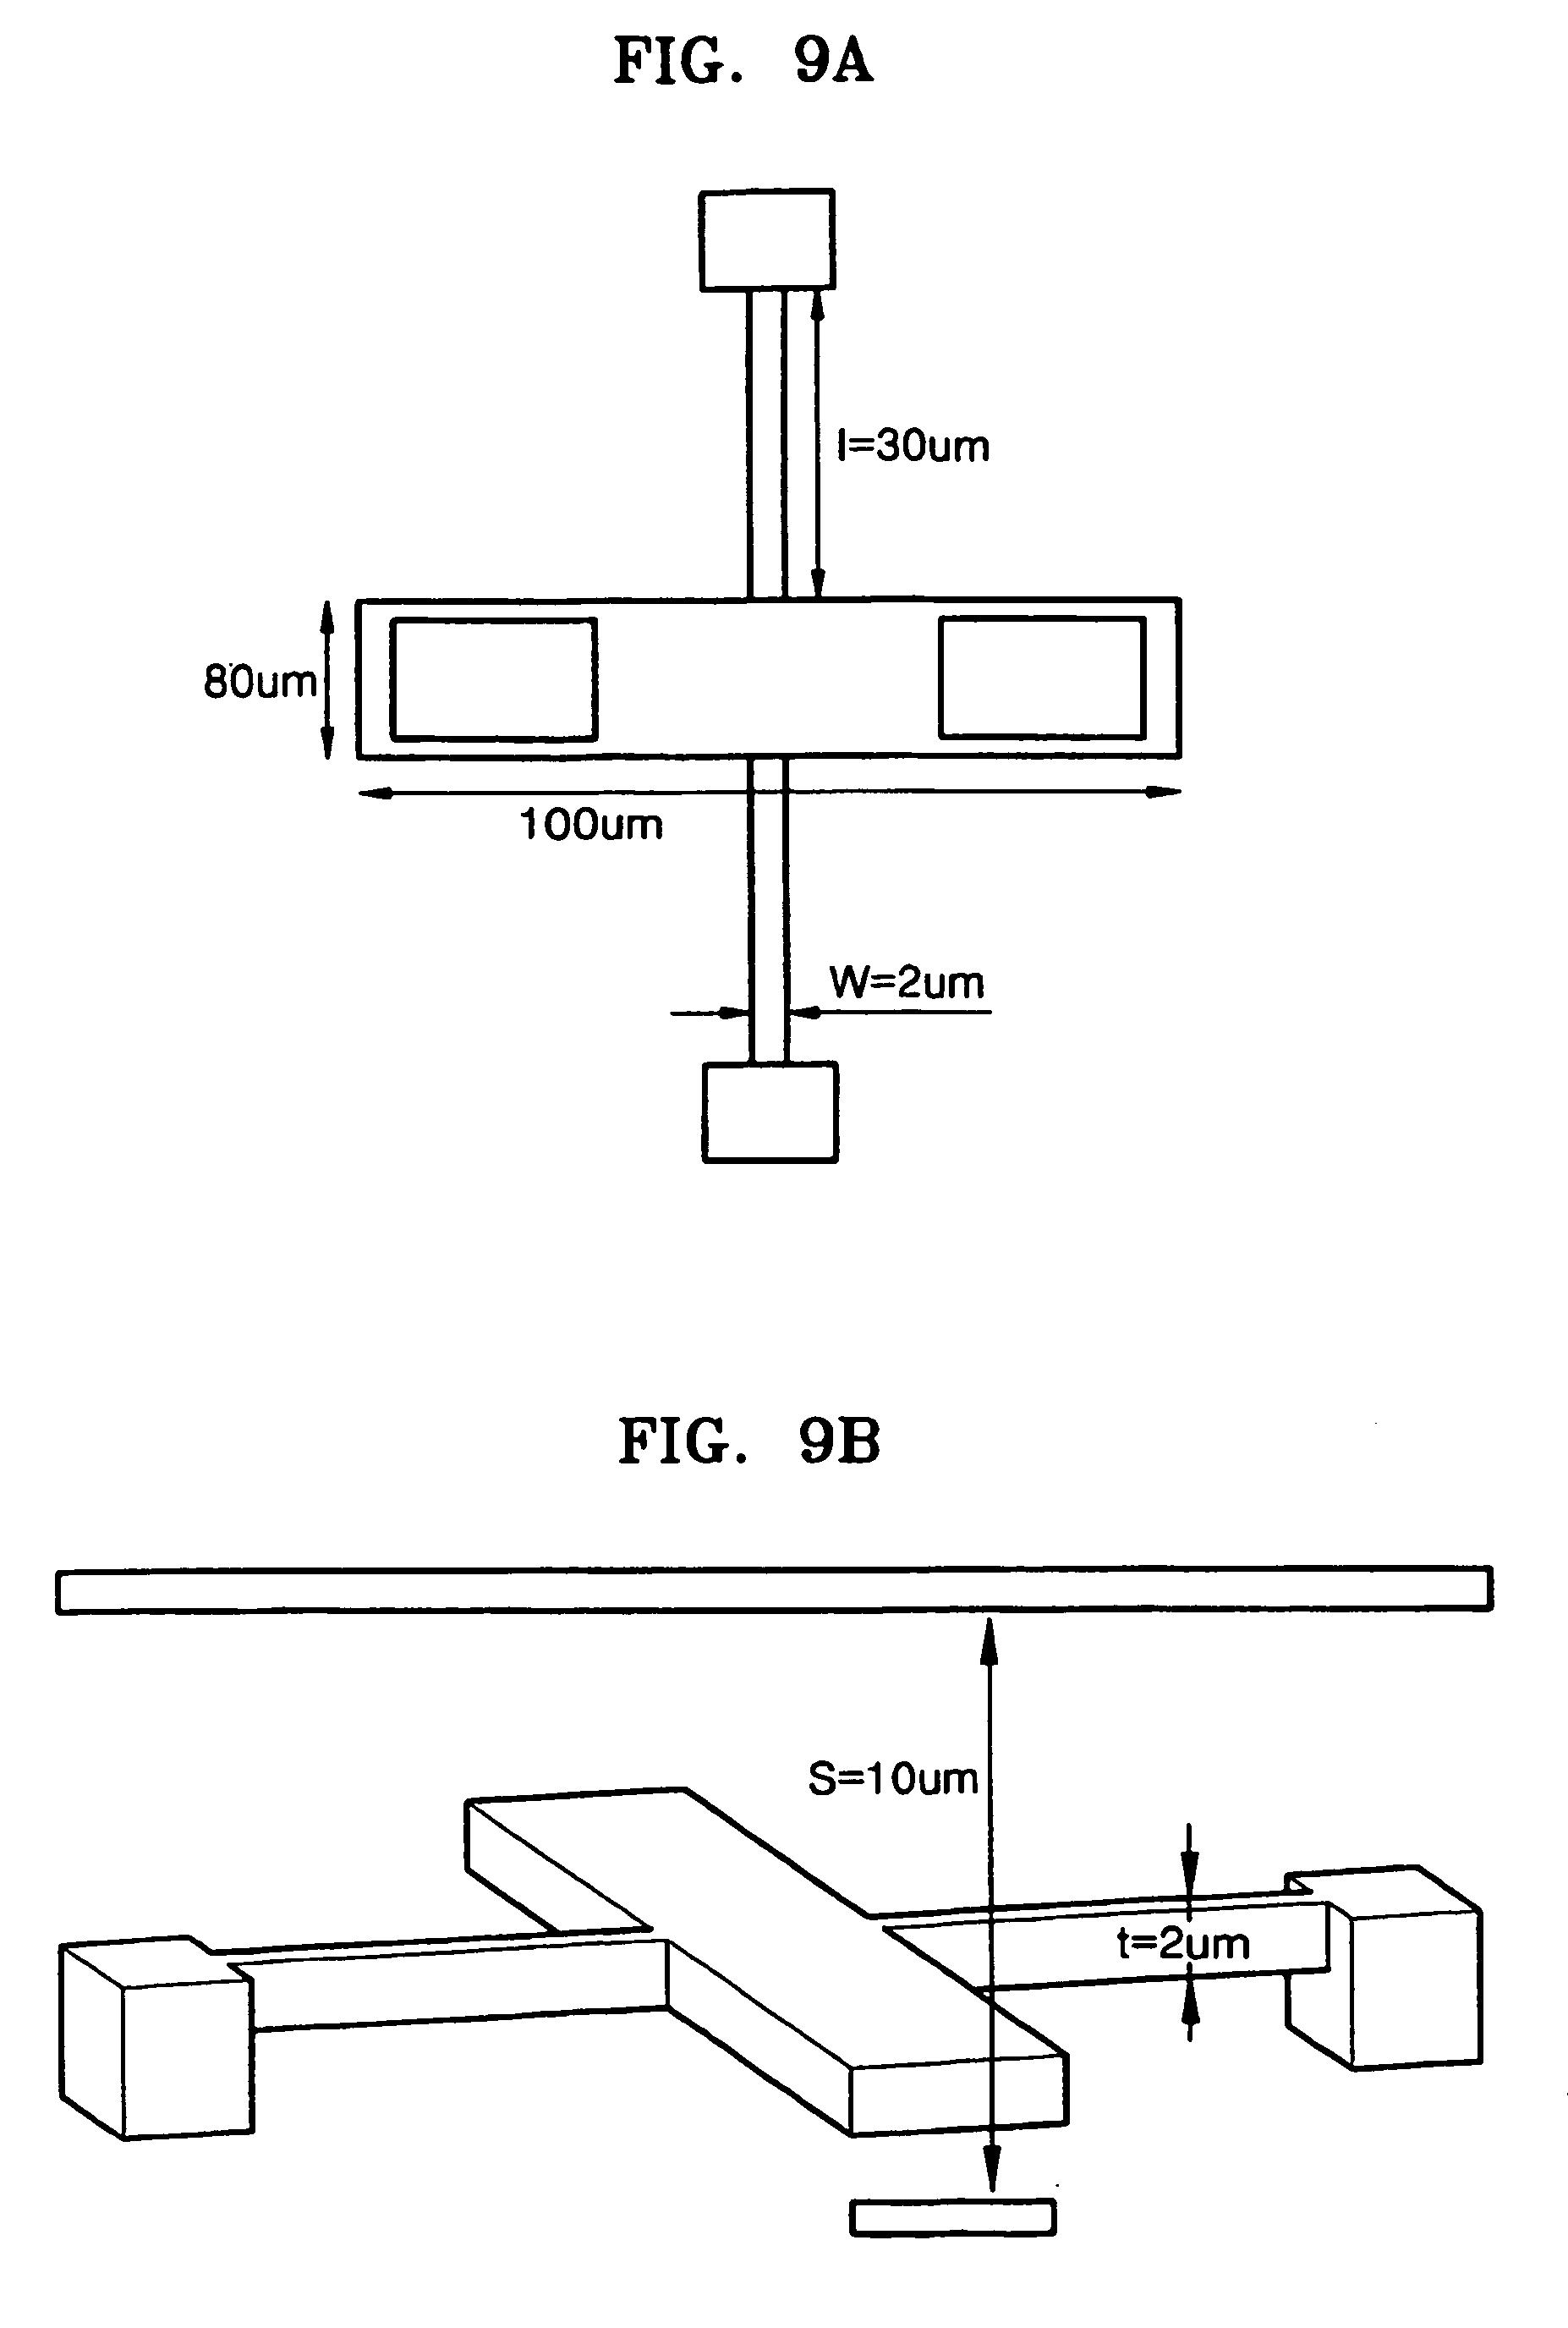 专利ep1705486b1 - sensing